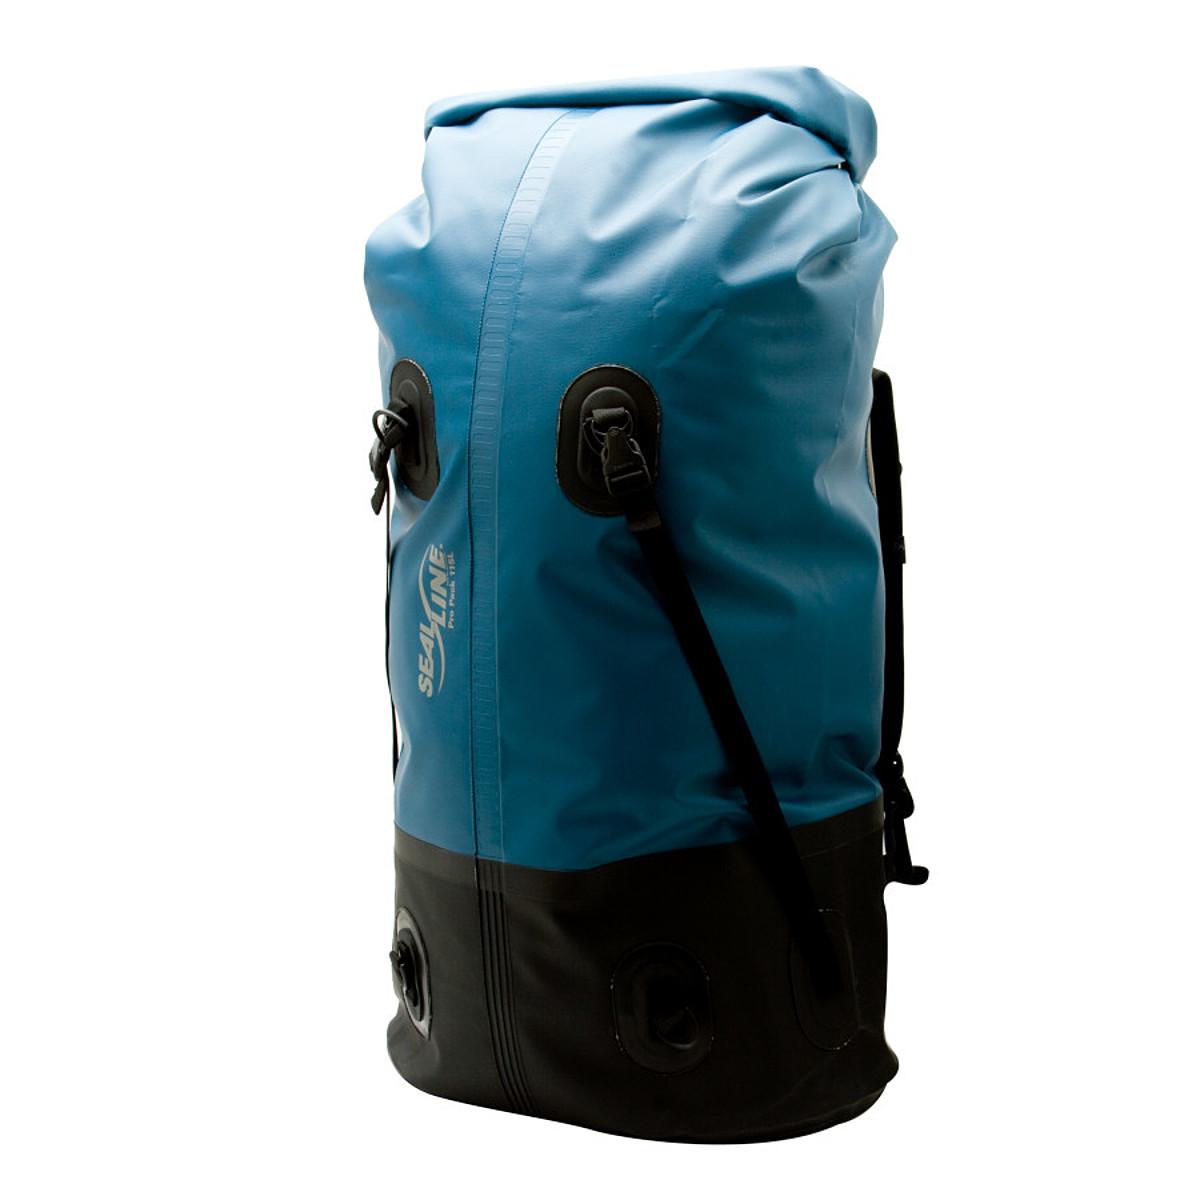 SealLine Pro Portage Pack